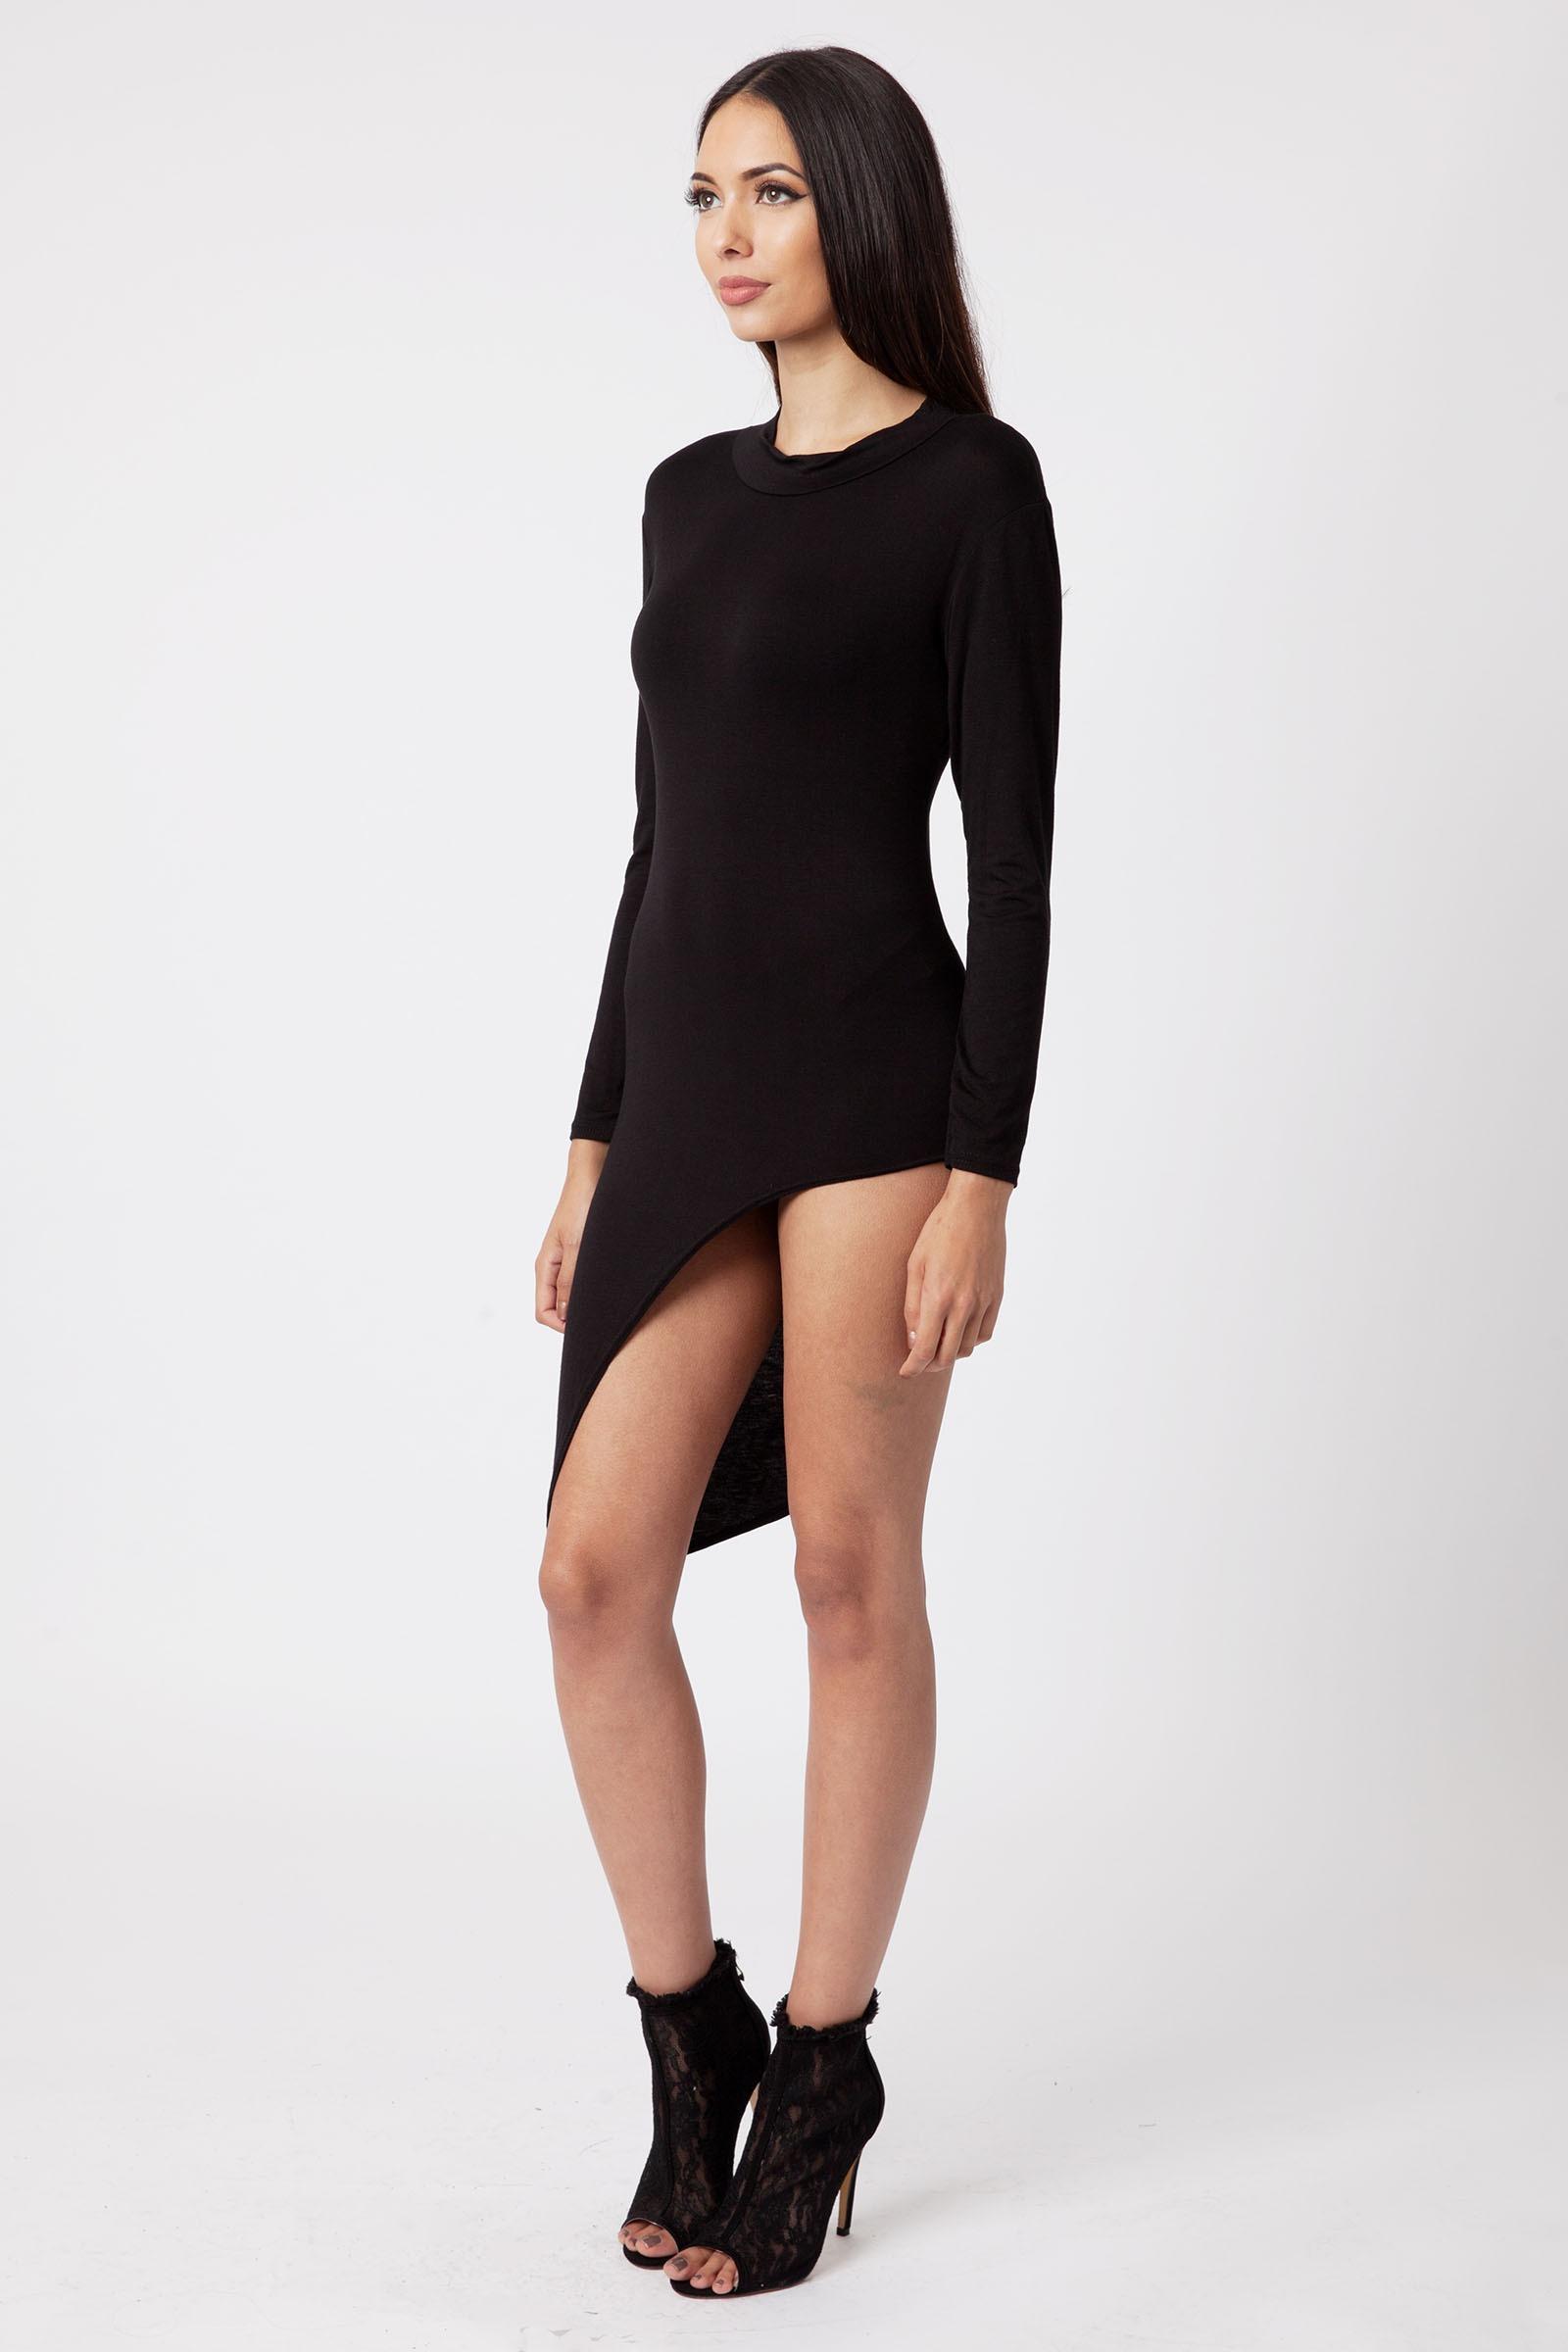 Black long sleeve bodycon dress long length